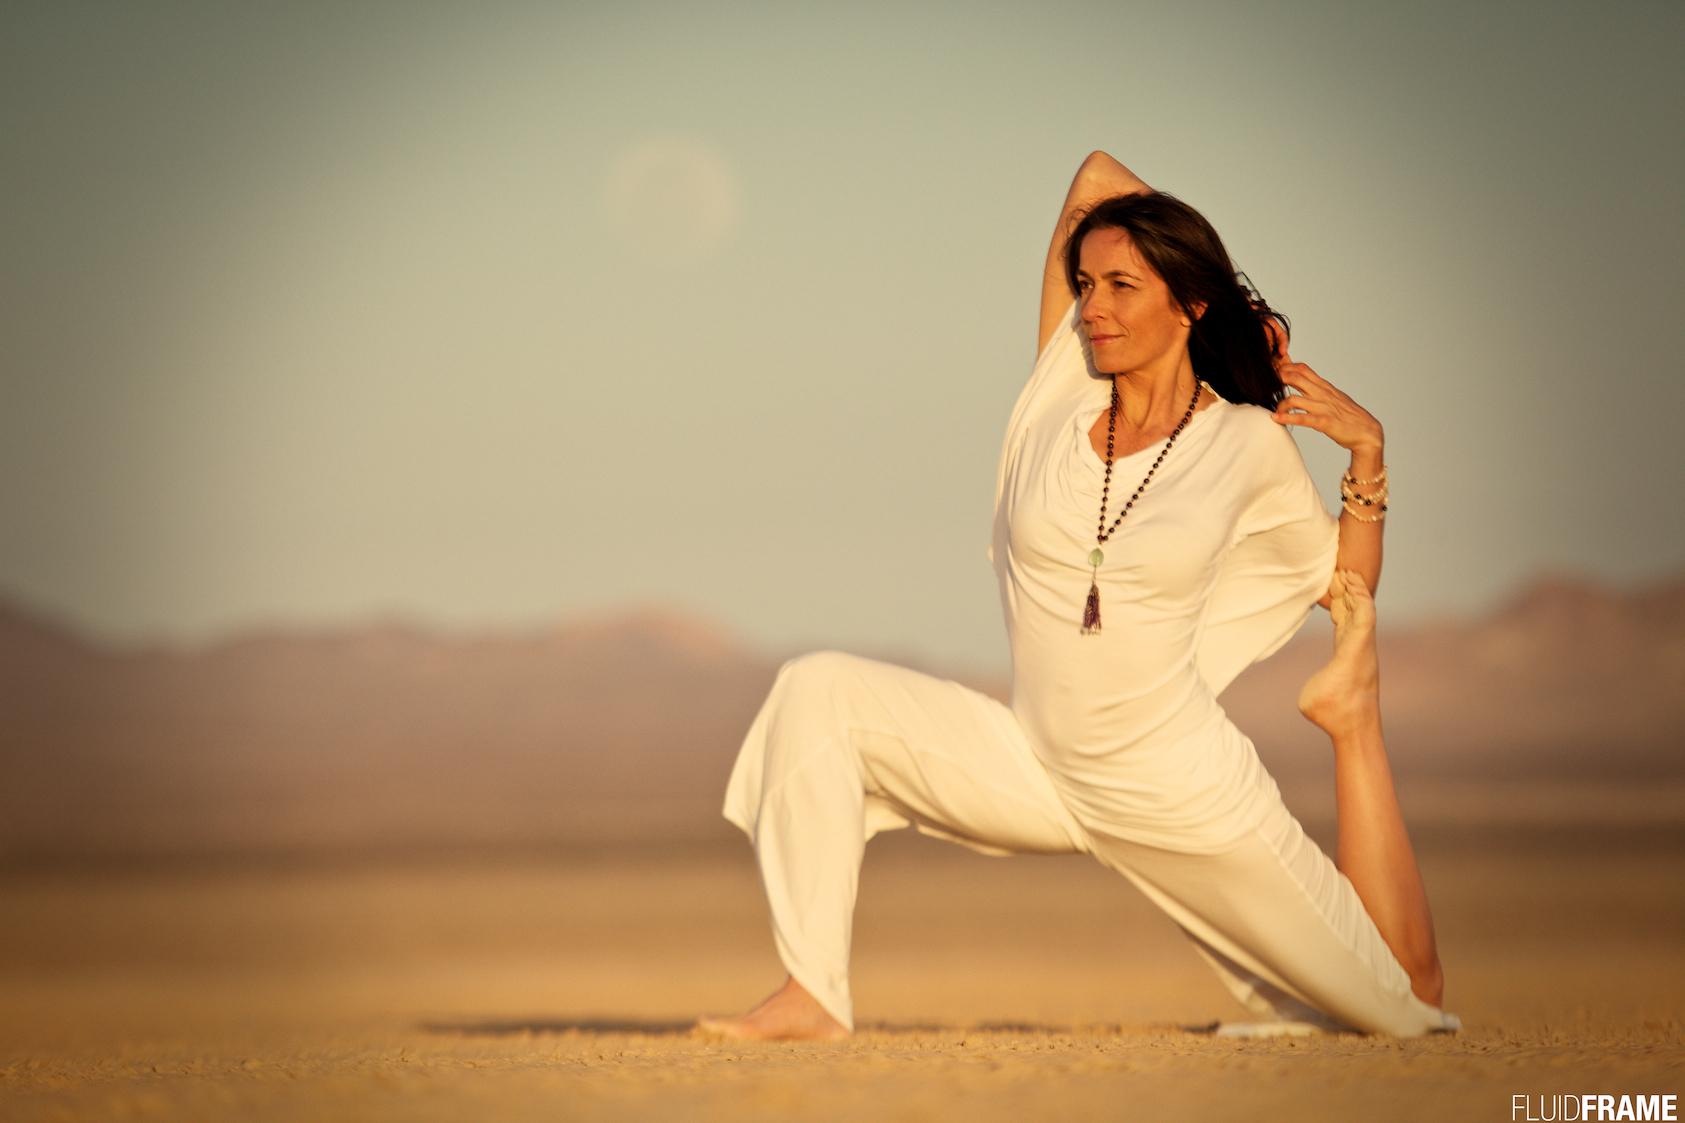 Kia Miller Kundalini Yoga